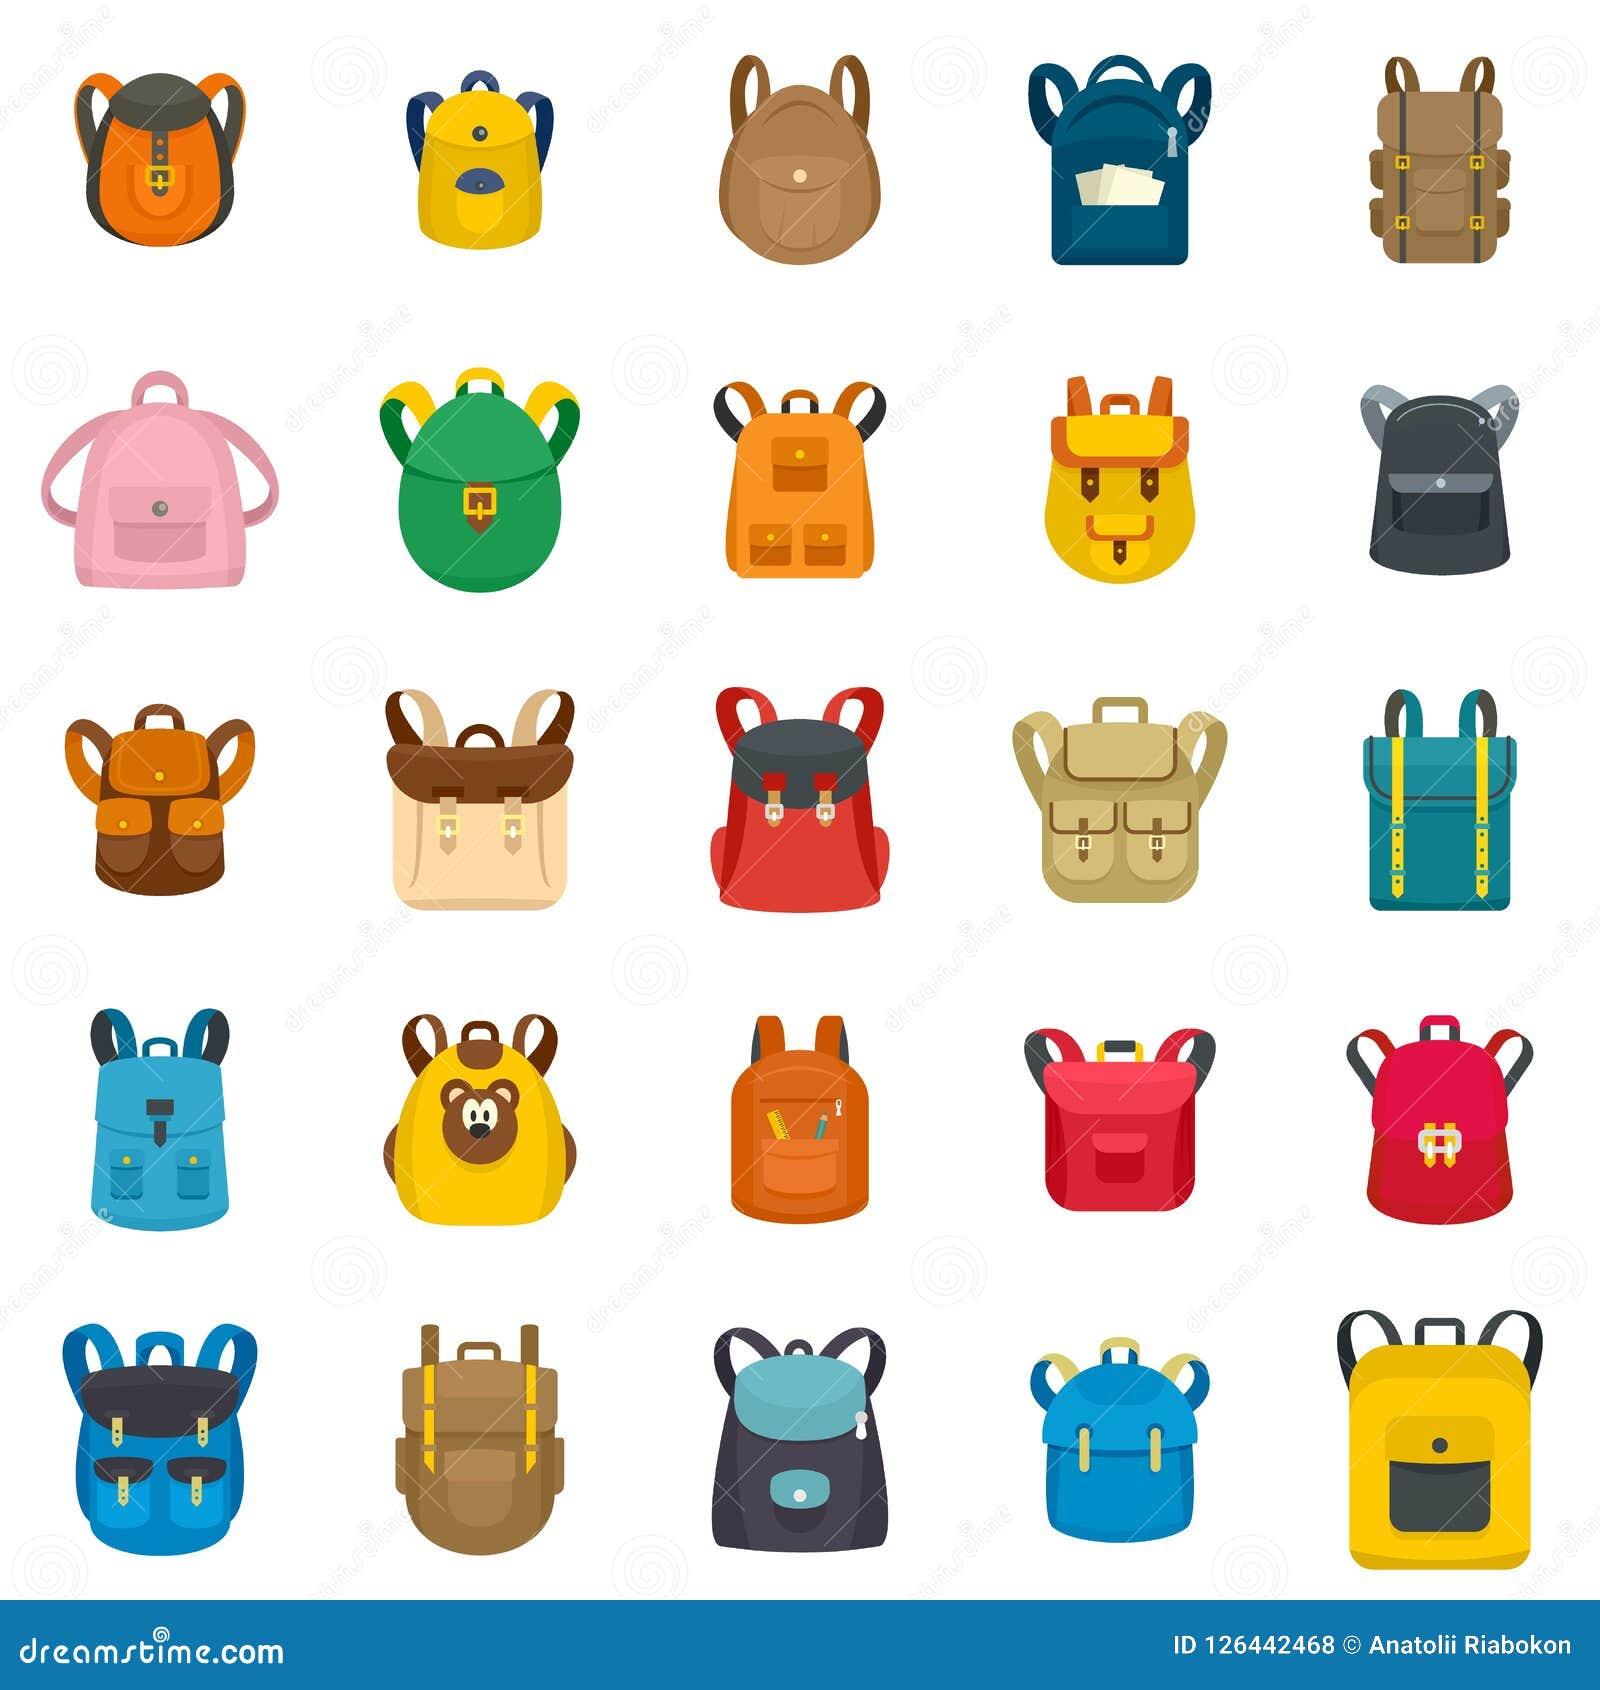 02a135a1b9d3 Backpack school travel sport kid camping bag icons set. Flat illustration  of 25 backpack school travel sport kid camping bag vector icons for web